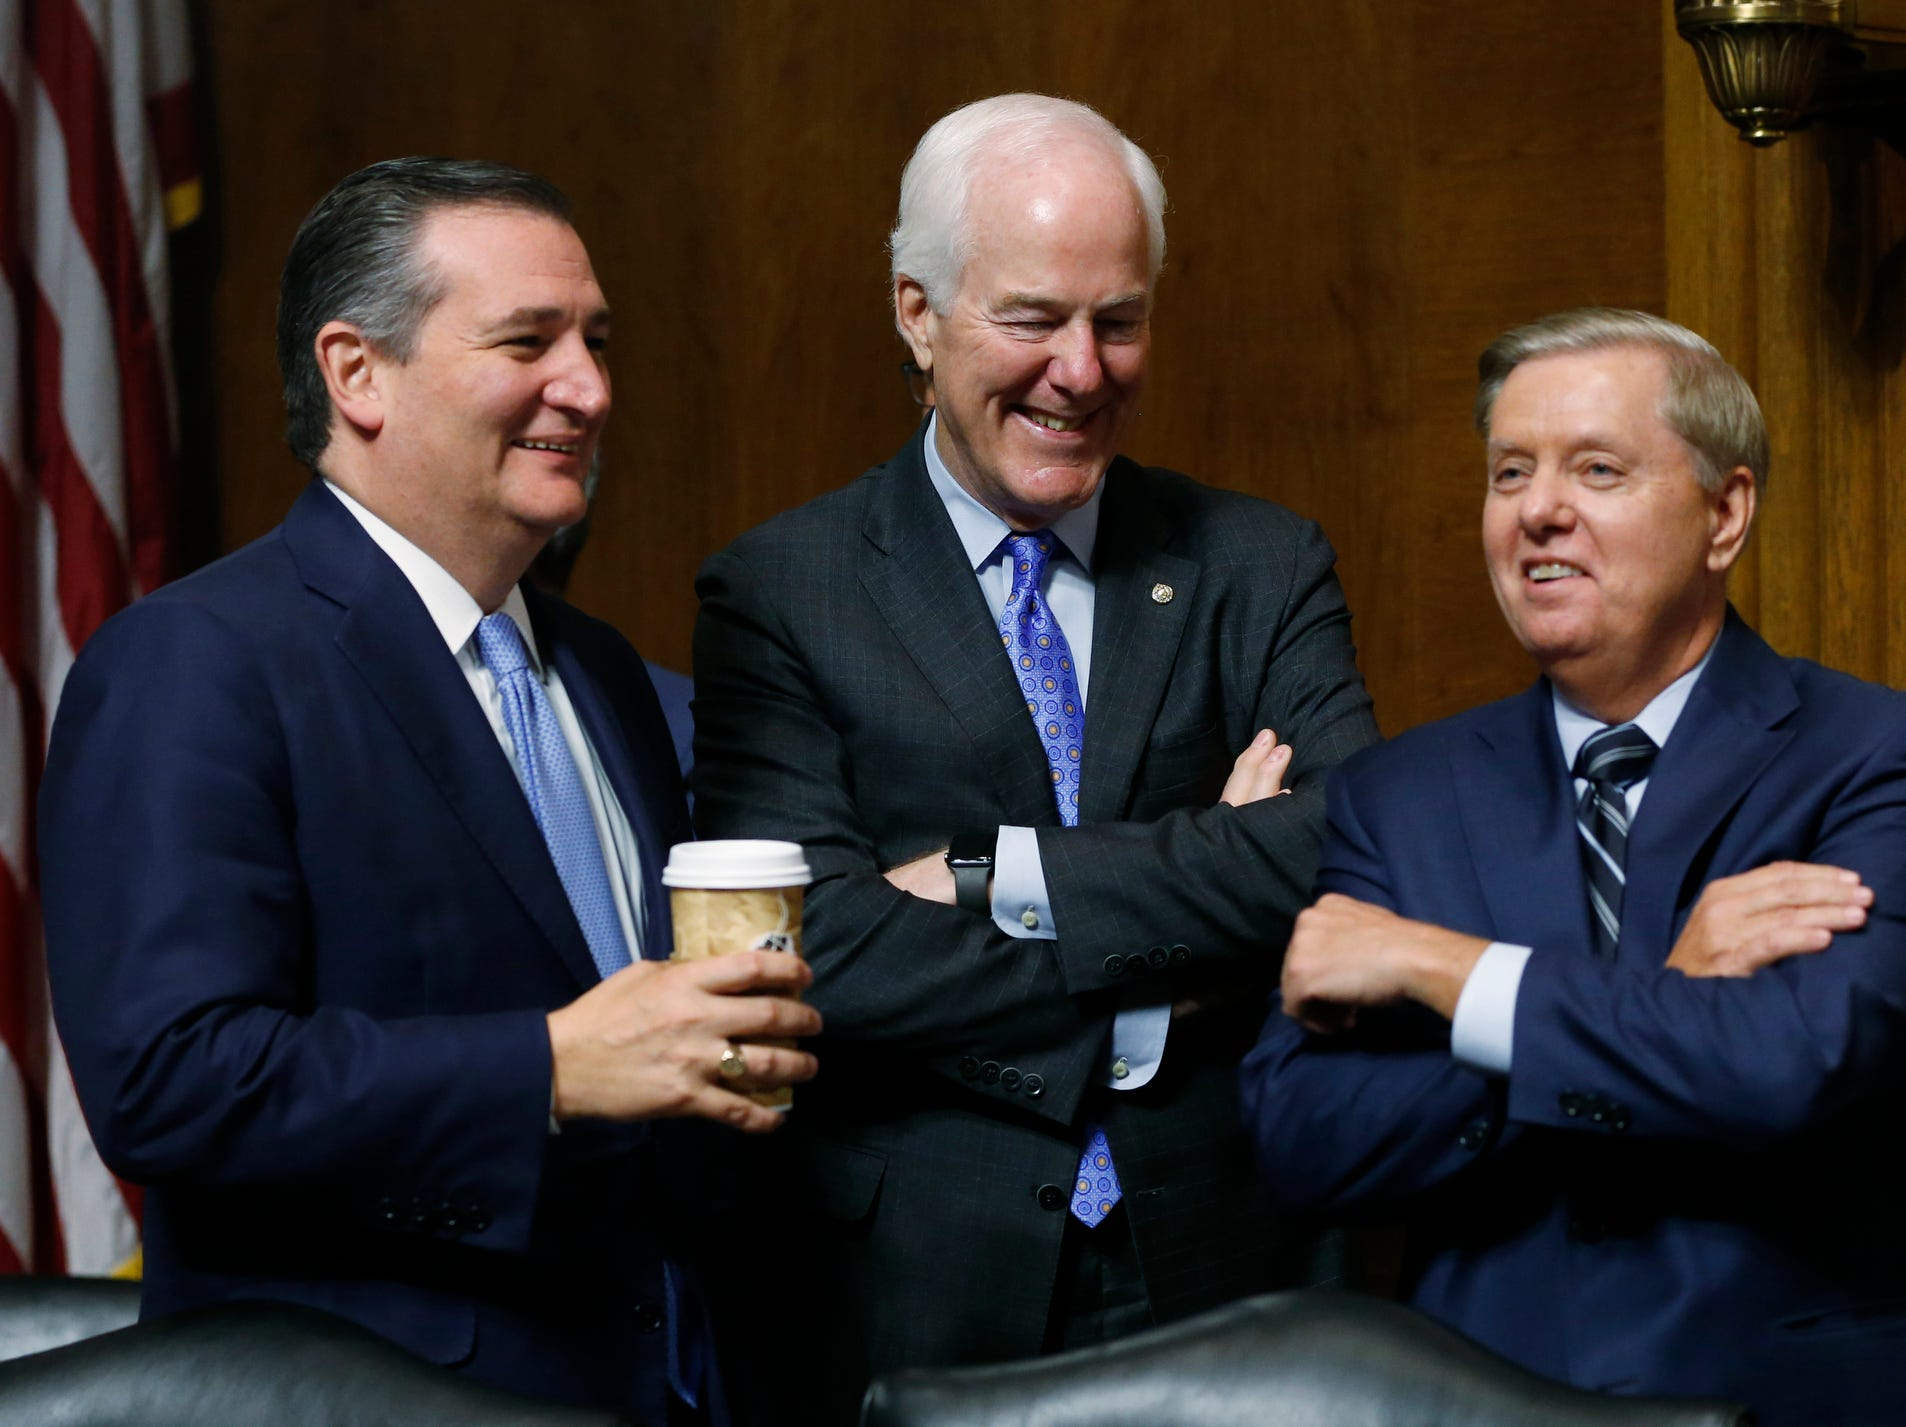 Republican Senators from left, Sen. Ted Cruz, R-Texas, Sen. John Cornyn, R-Texas and Sen. Lindsey Graham, R-S.C., talk during a break in the hearing with Supreme Court nominee Brett Kavanaugh.